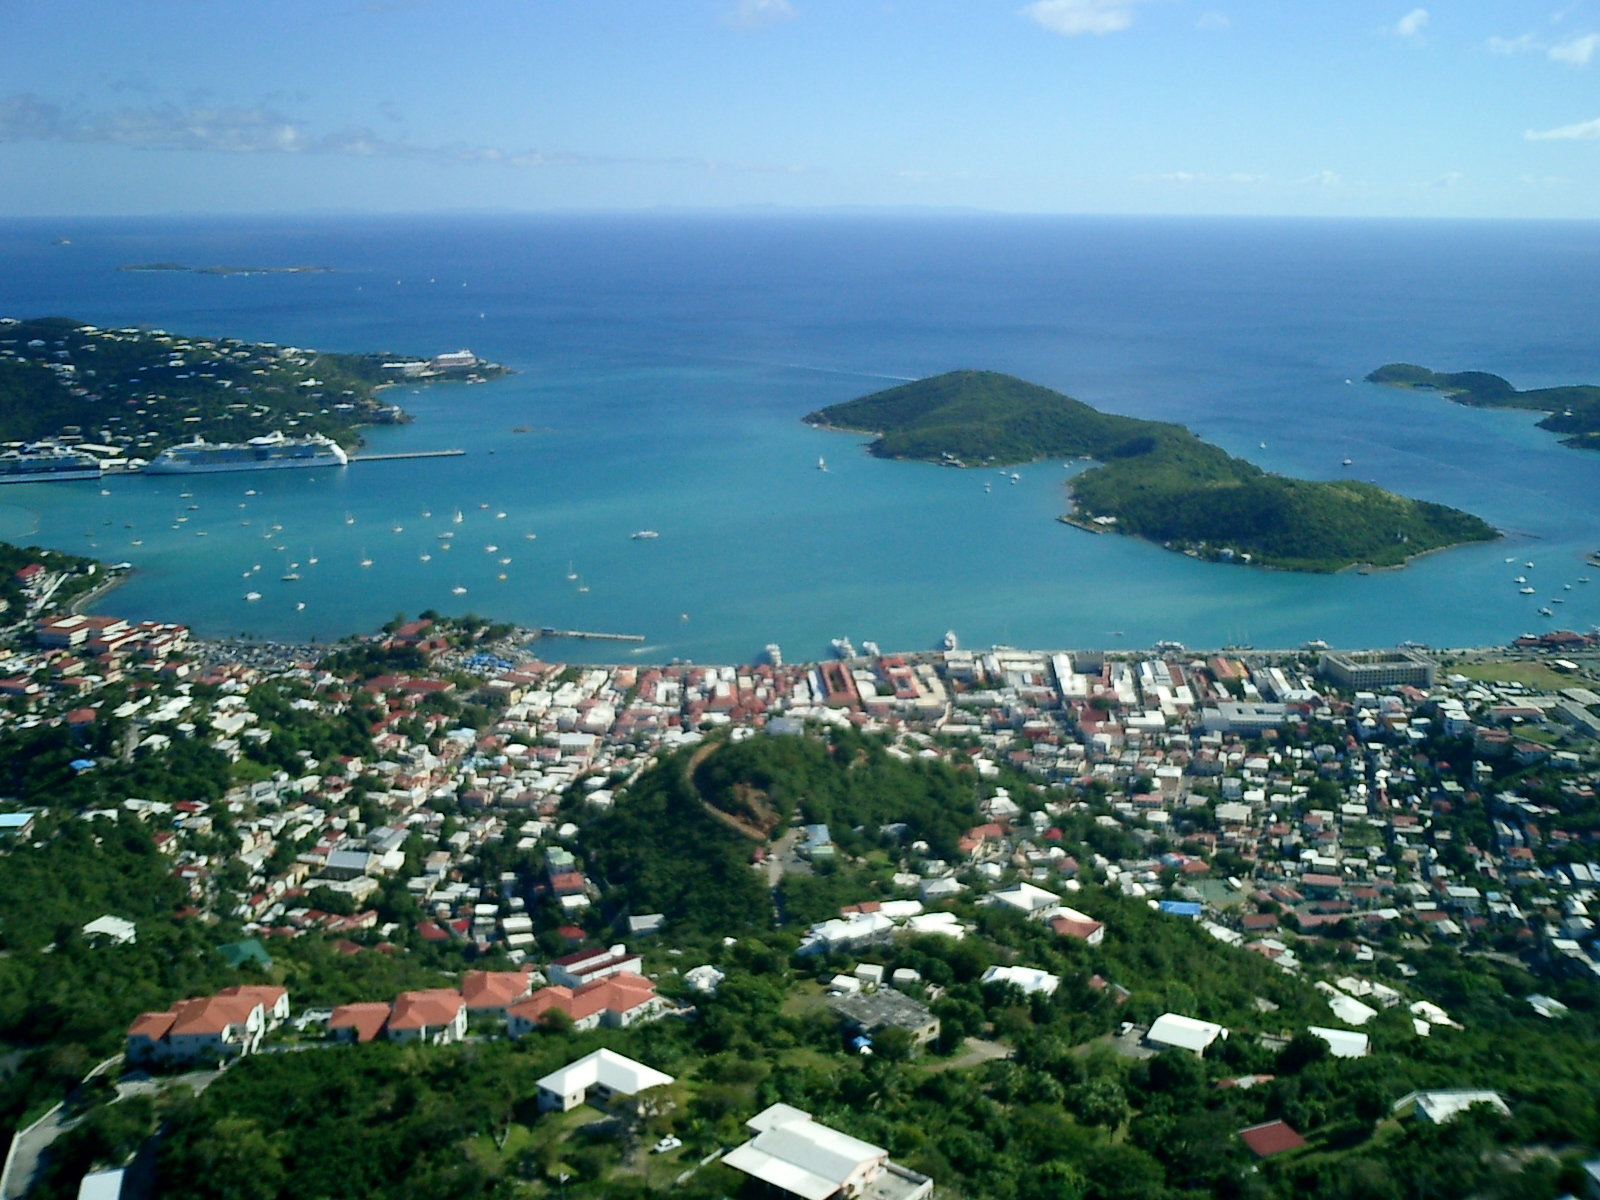 Noleggio Barche St. Thomas - Navalia | Noleggia un Sogno